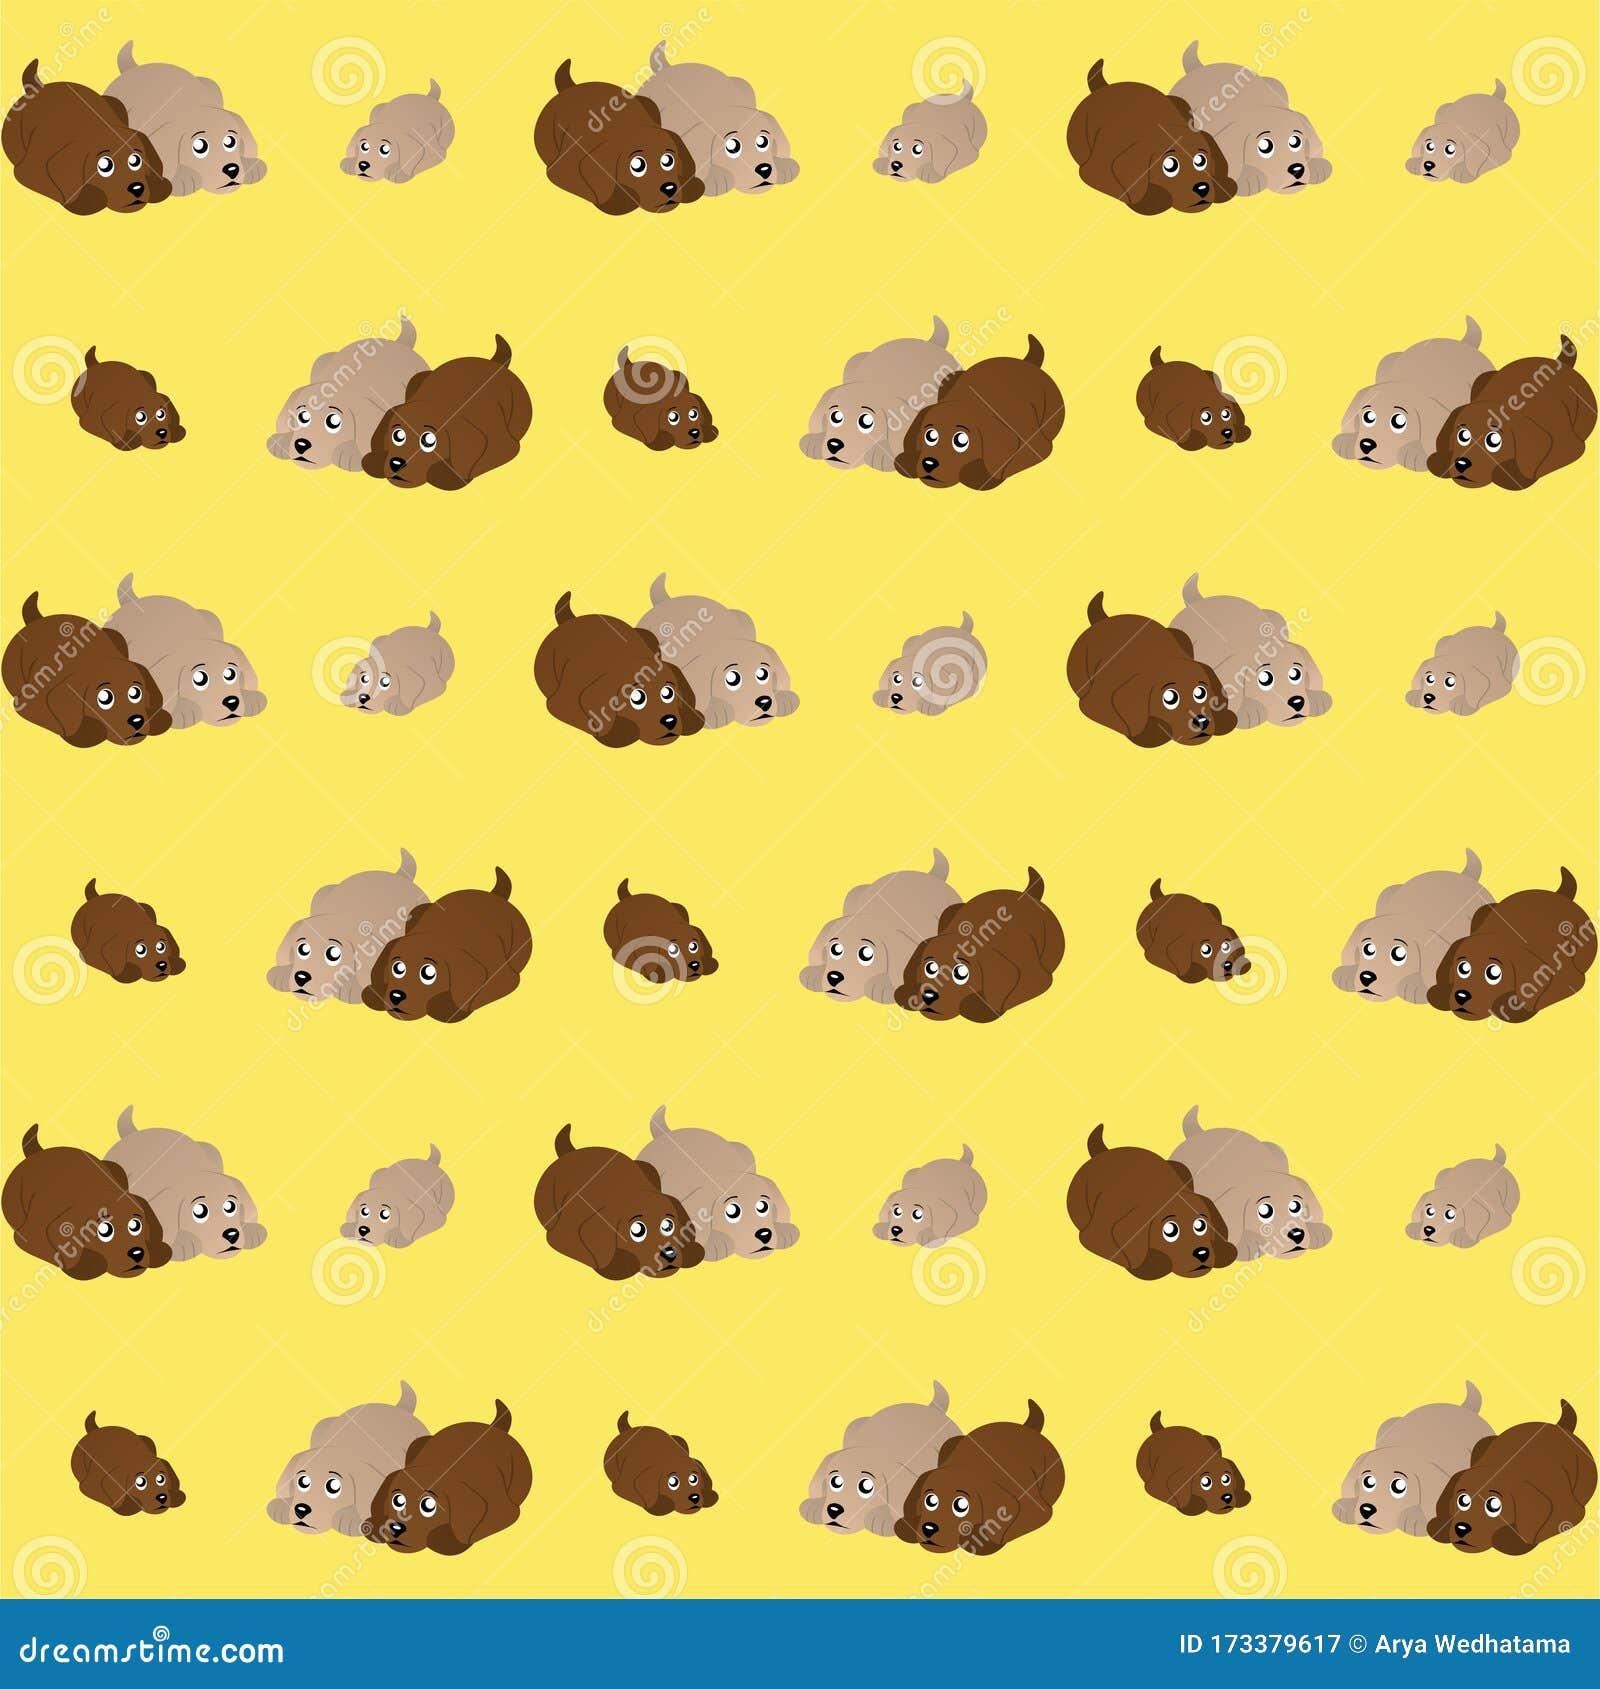 Dog Or Puppy Cute Illustration Cartoon Funny Character Pattern Wallpaper Stock Illustration Illustration Of Design Pets 173379617